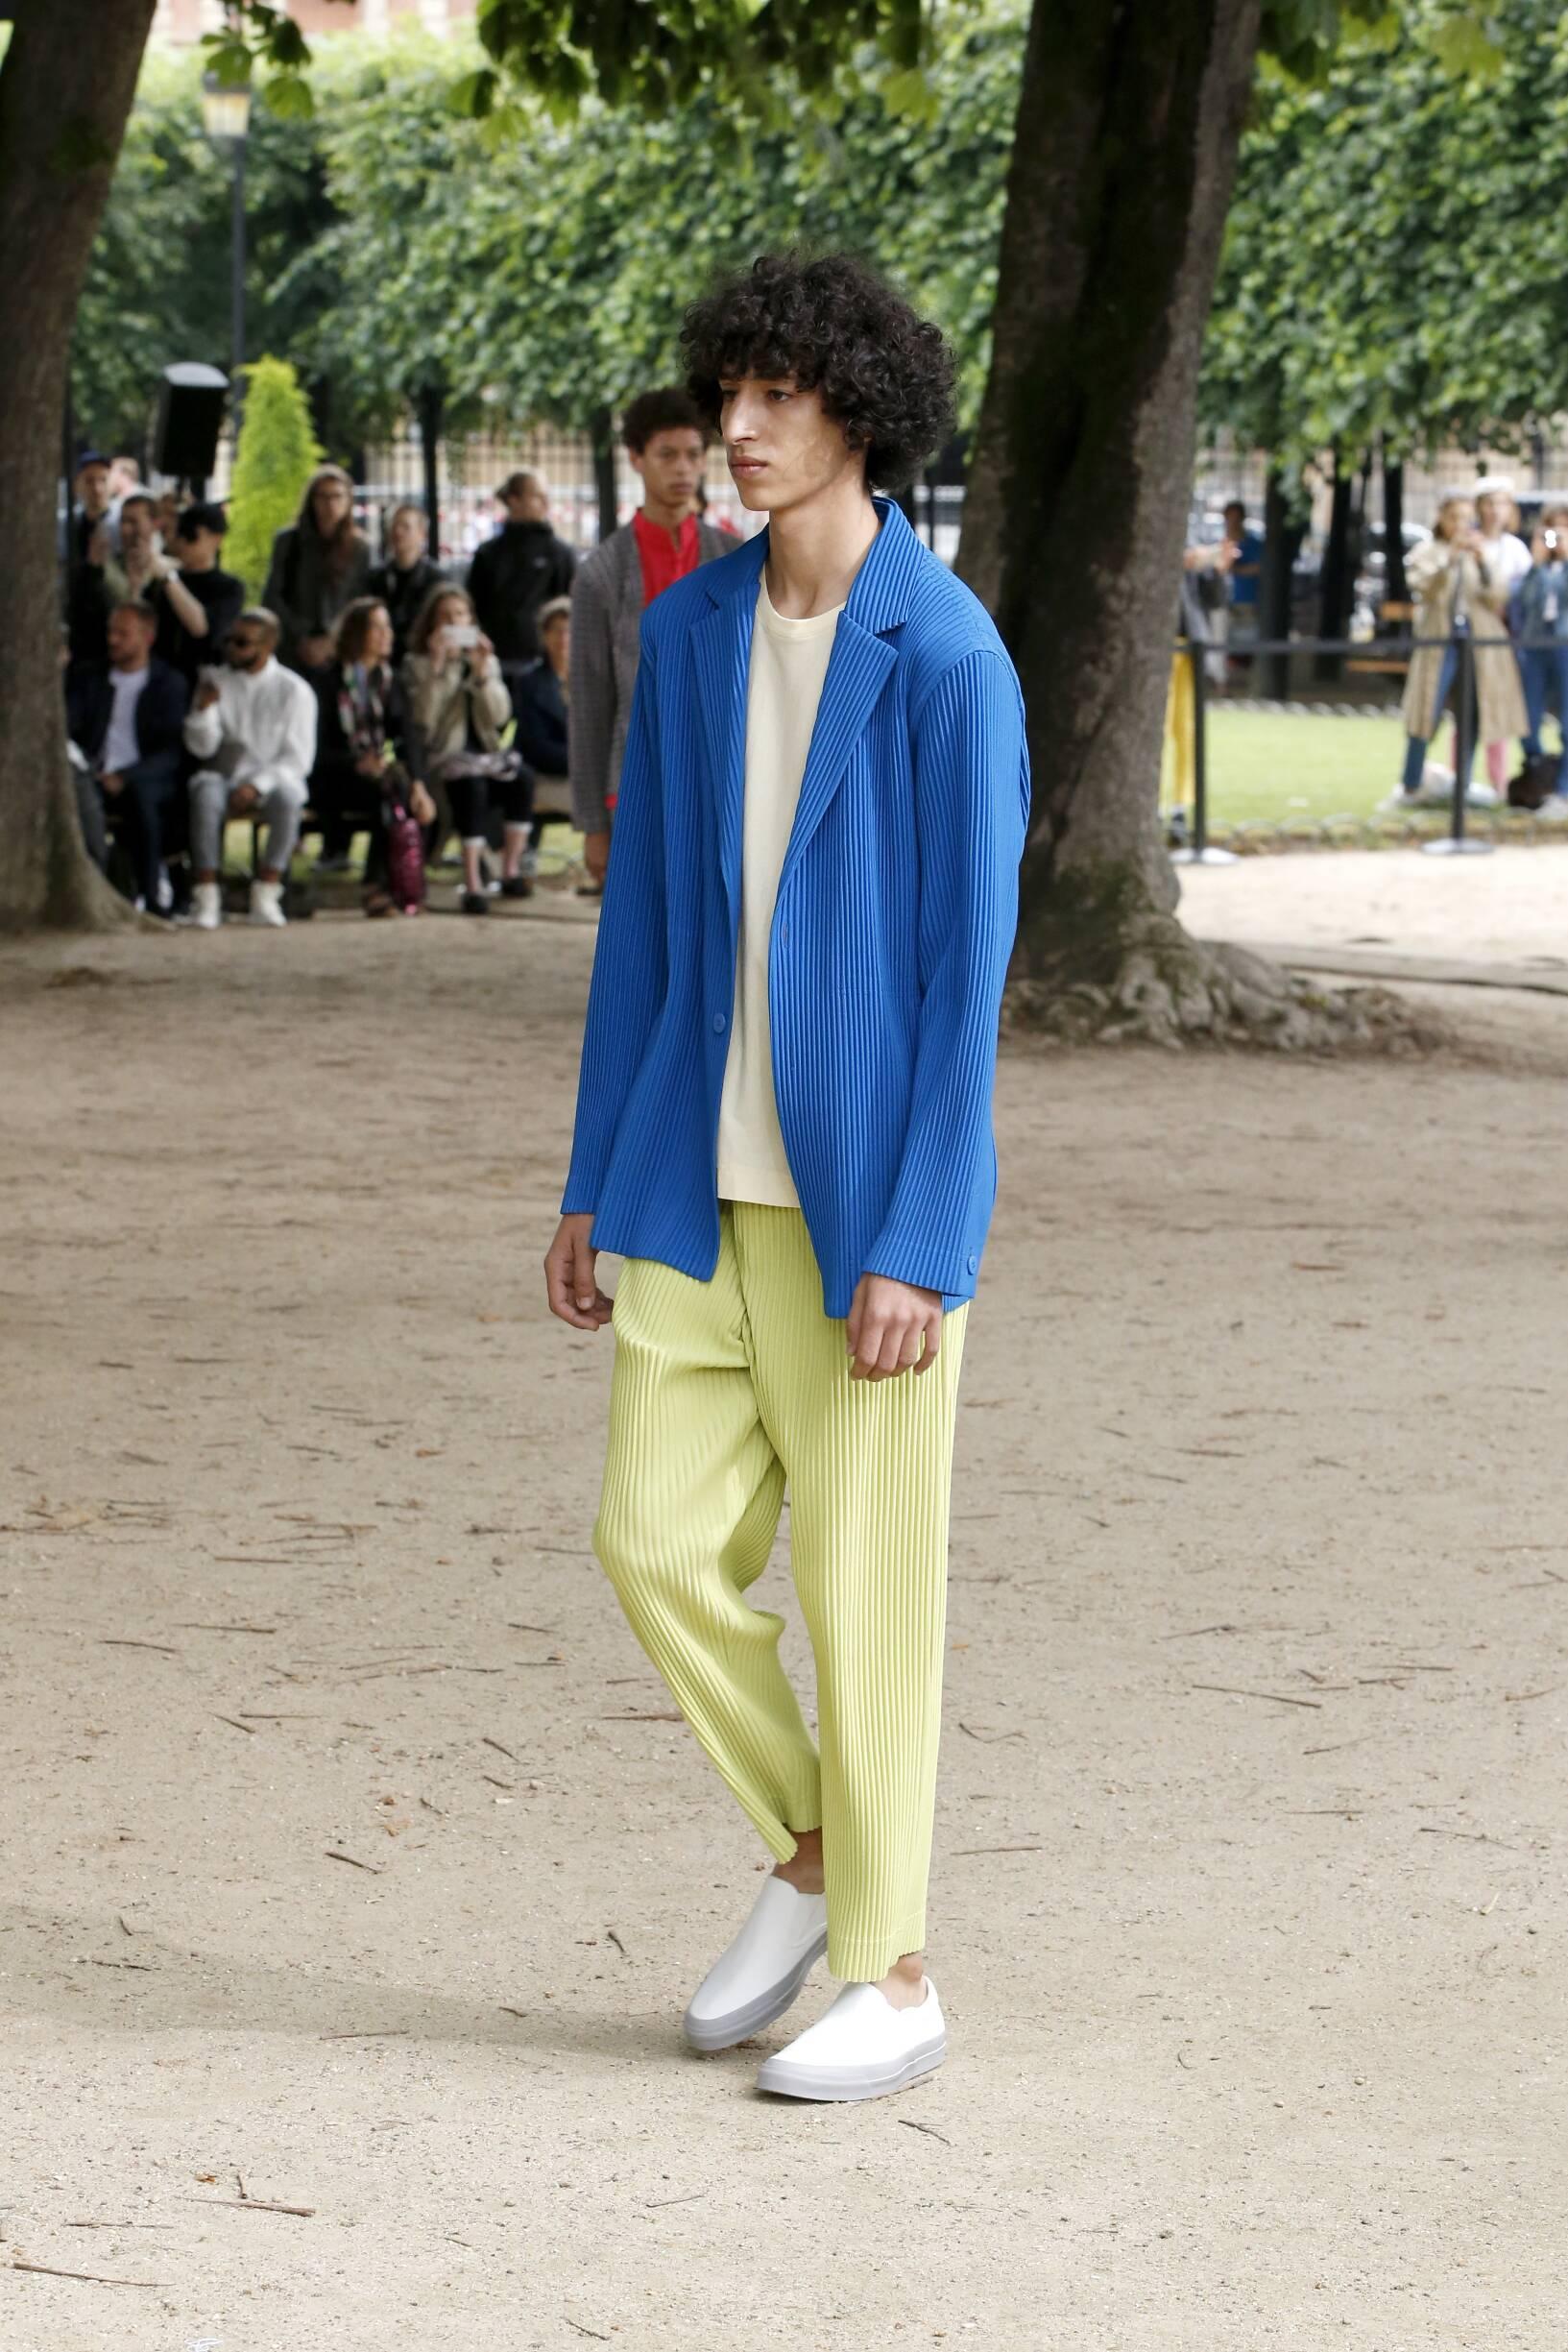 Issey Miyake SS 2020 Menswear